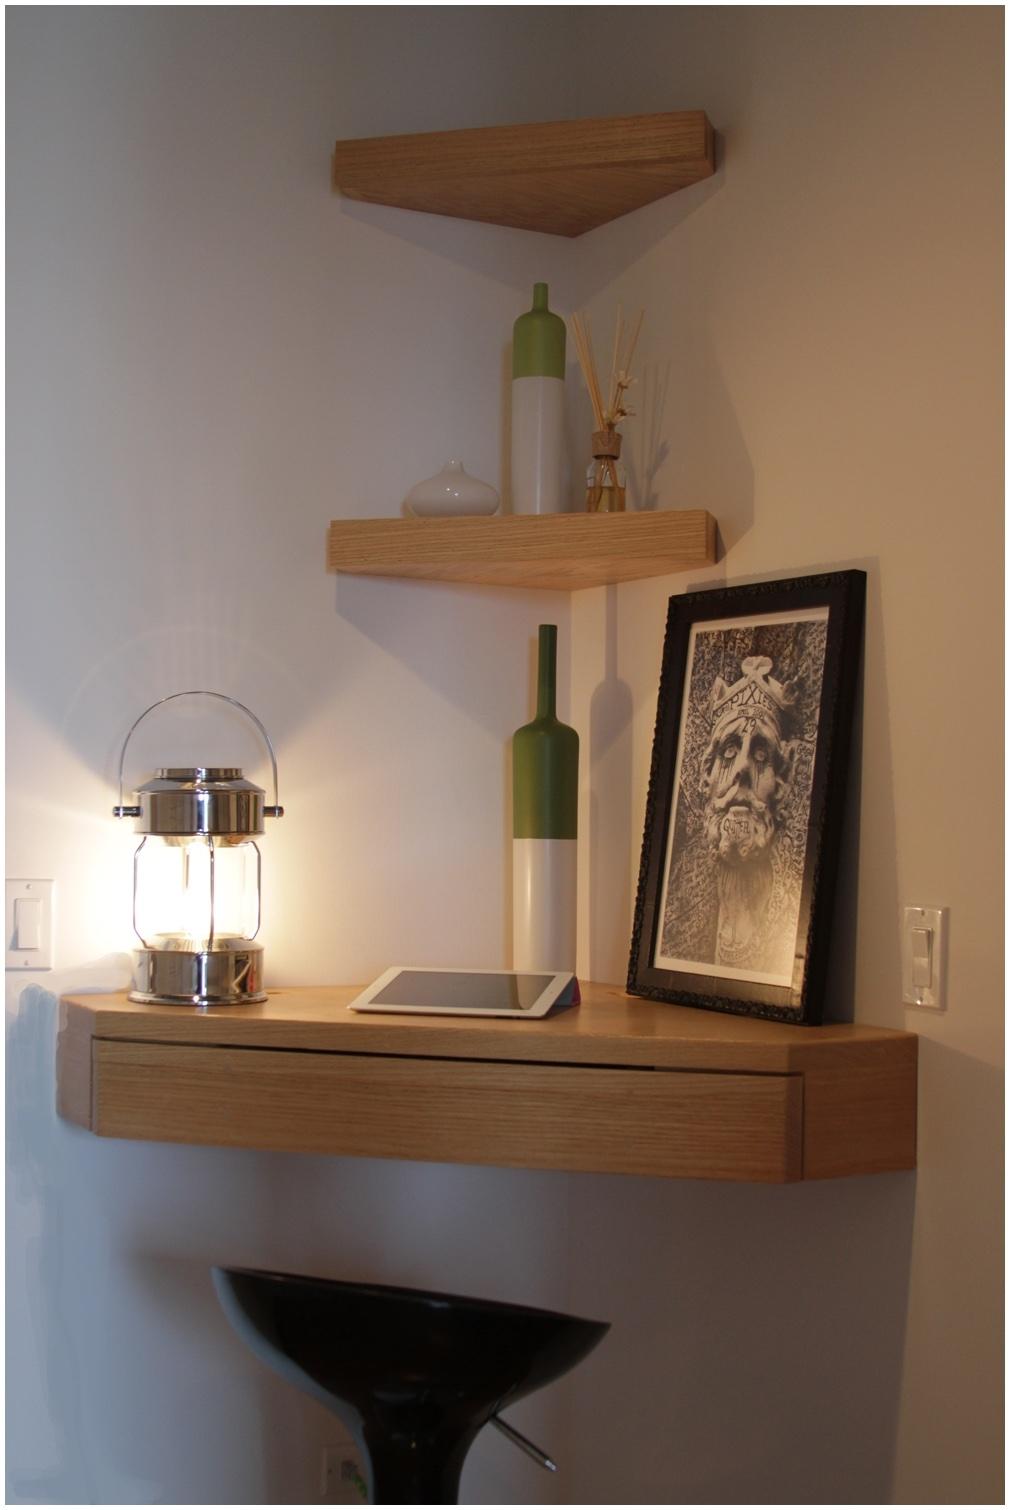 Popular Photo of Corner Shelf For Dvd Player